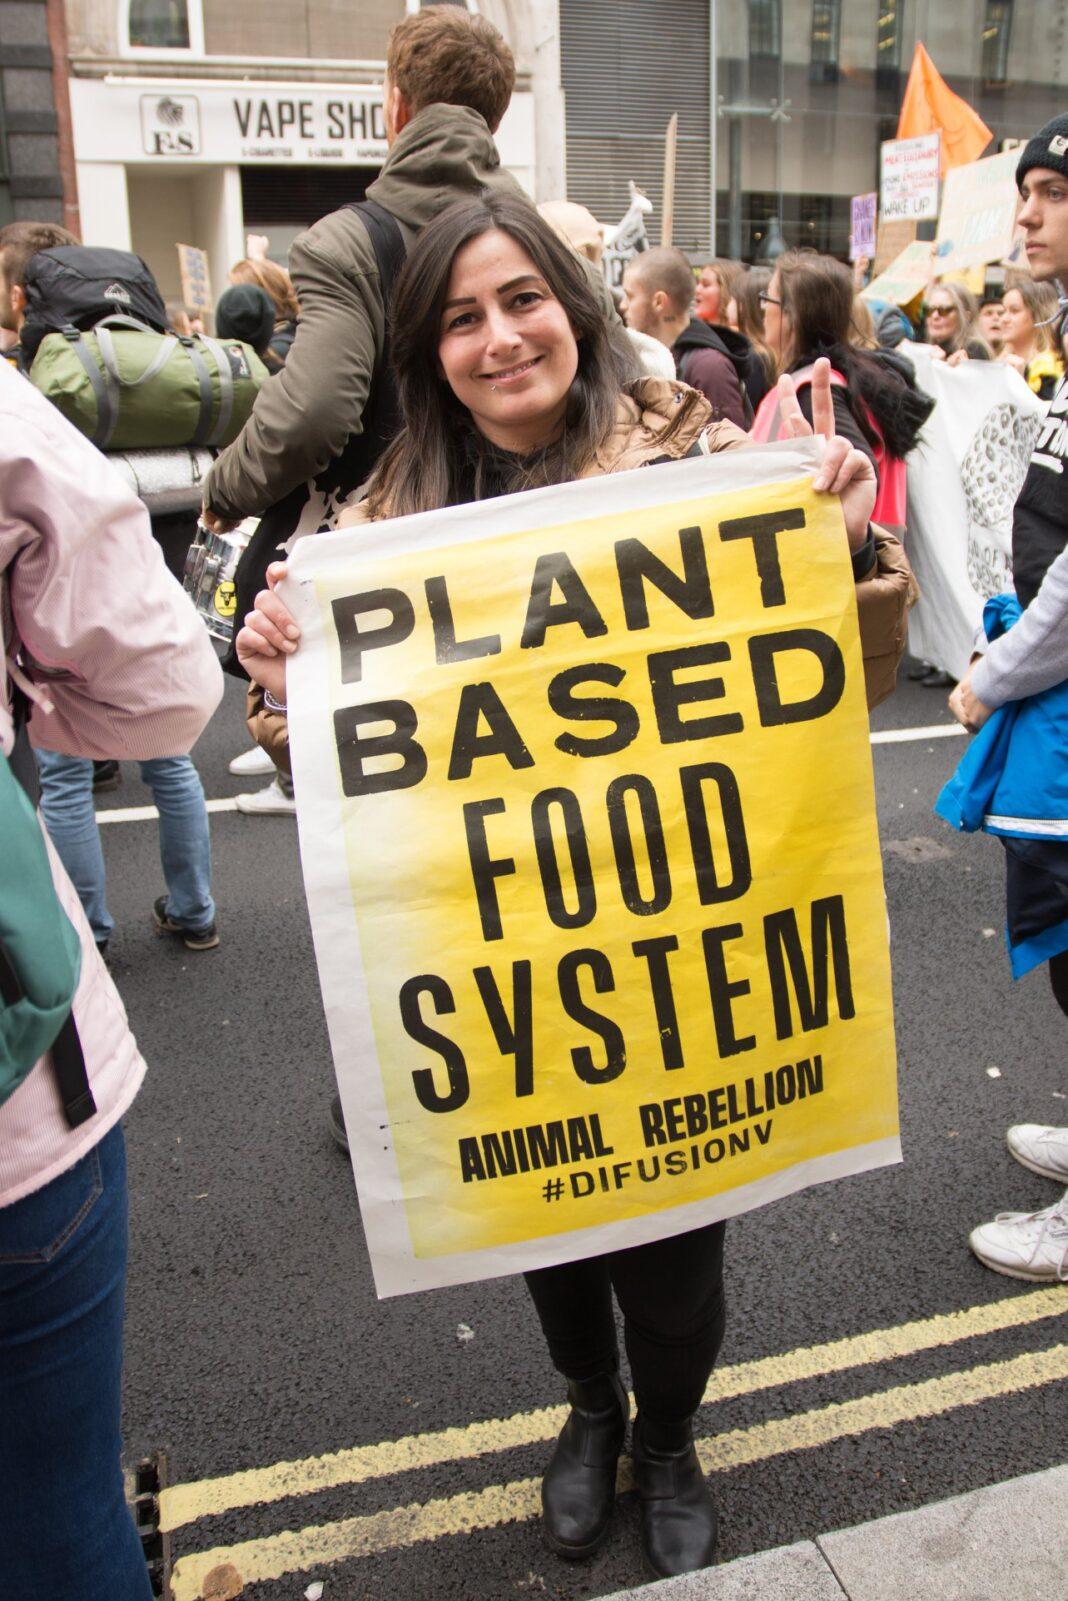 animal rebellion september protests